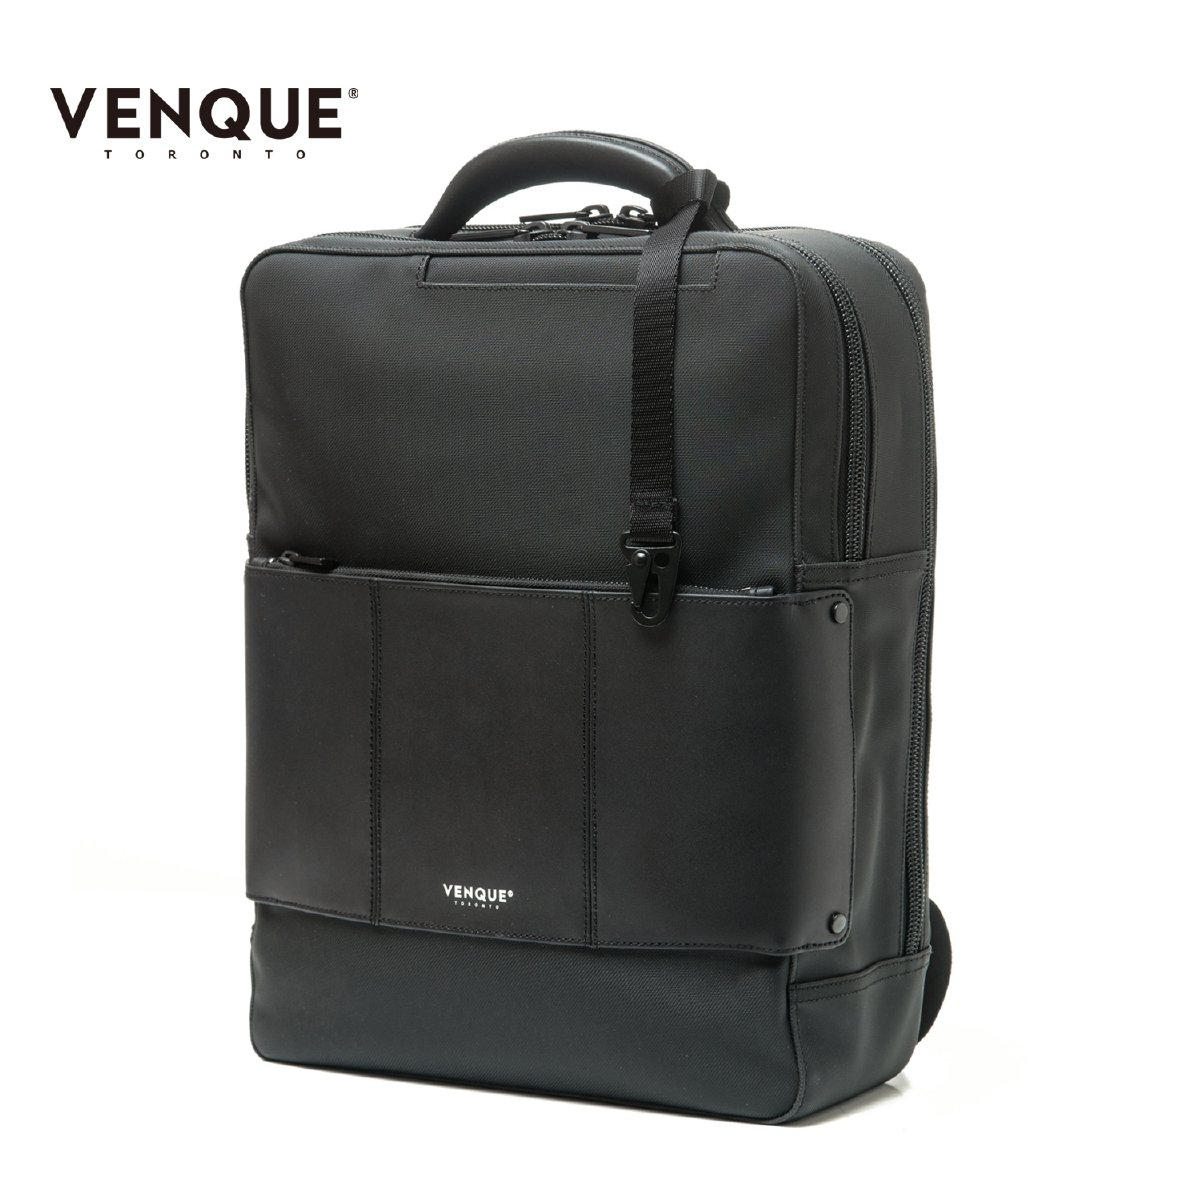 VENQUE ヴェンク CIENI BACKPACK メンズ/レディース カーボンブラック OS